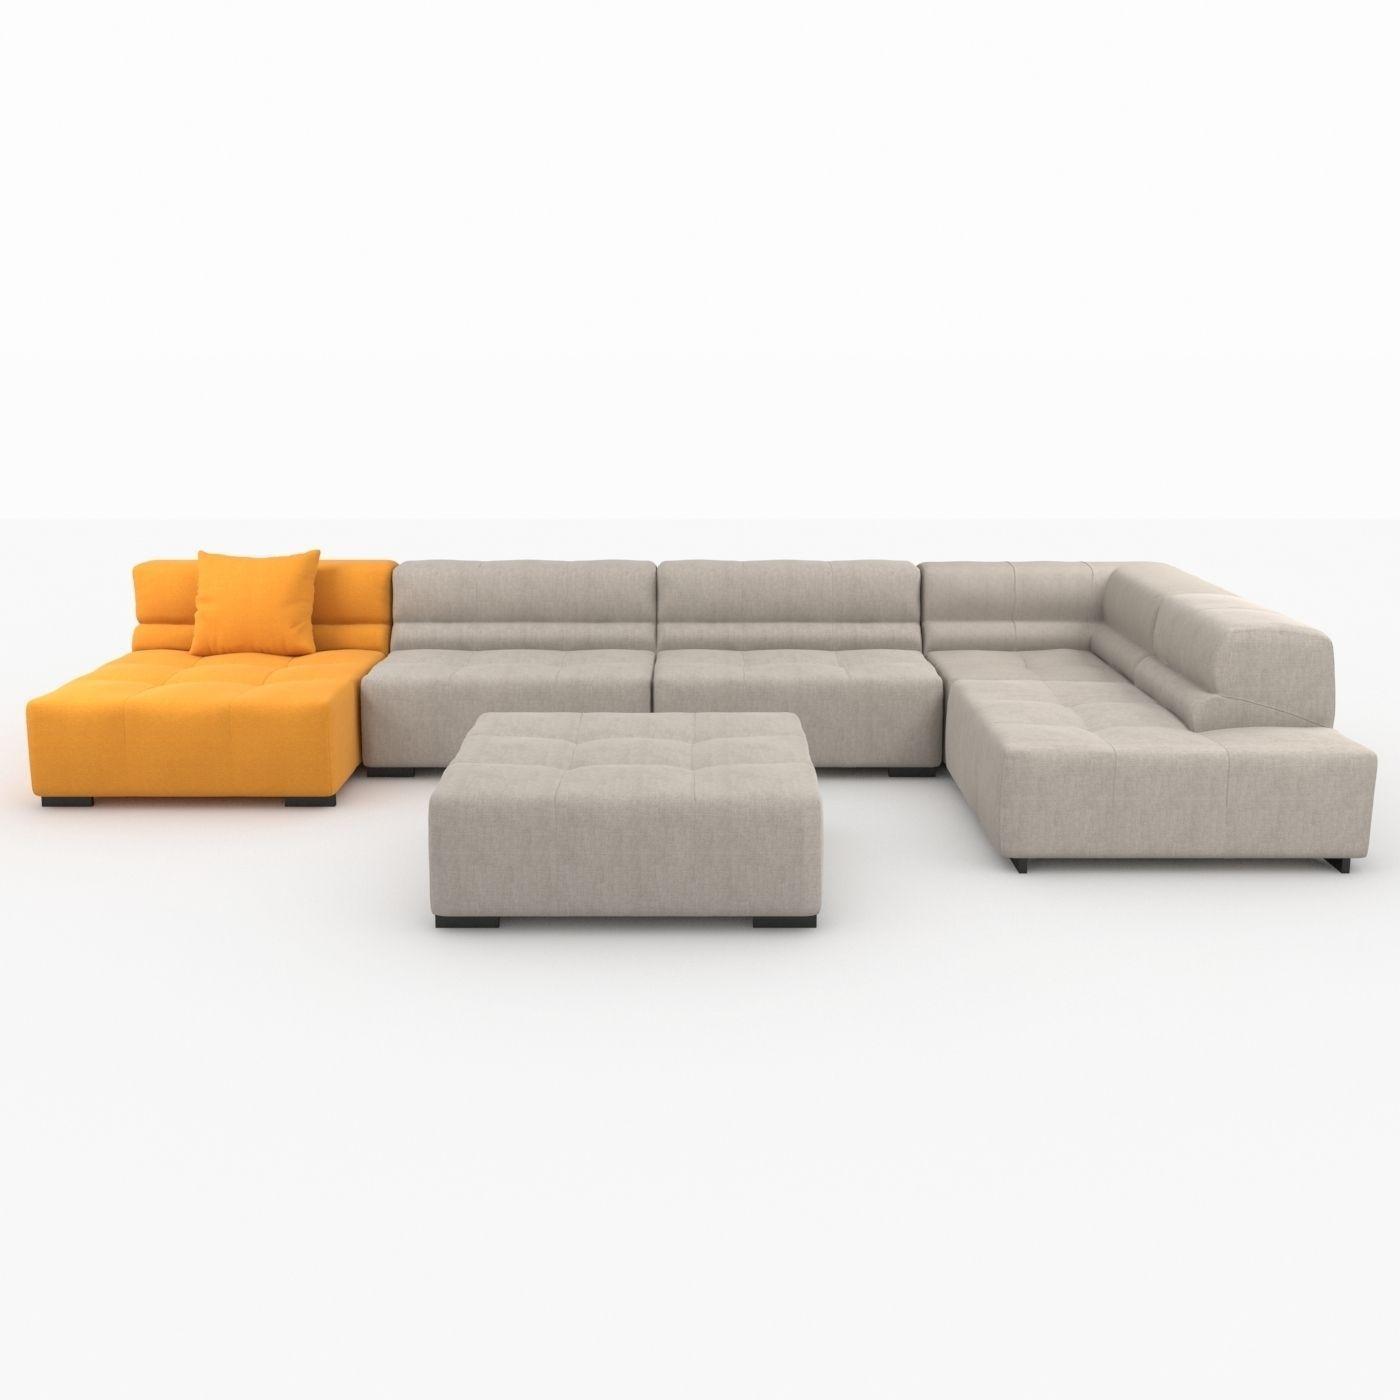 Wonderful Bb Italy Furniture. Tufty Time Sofa By Bb Italia 3d Model Max Obj 3ds Fbx